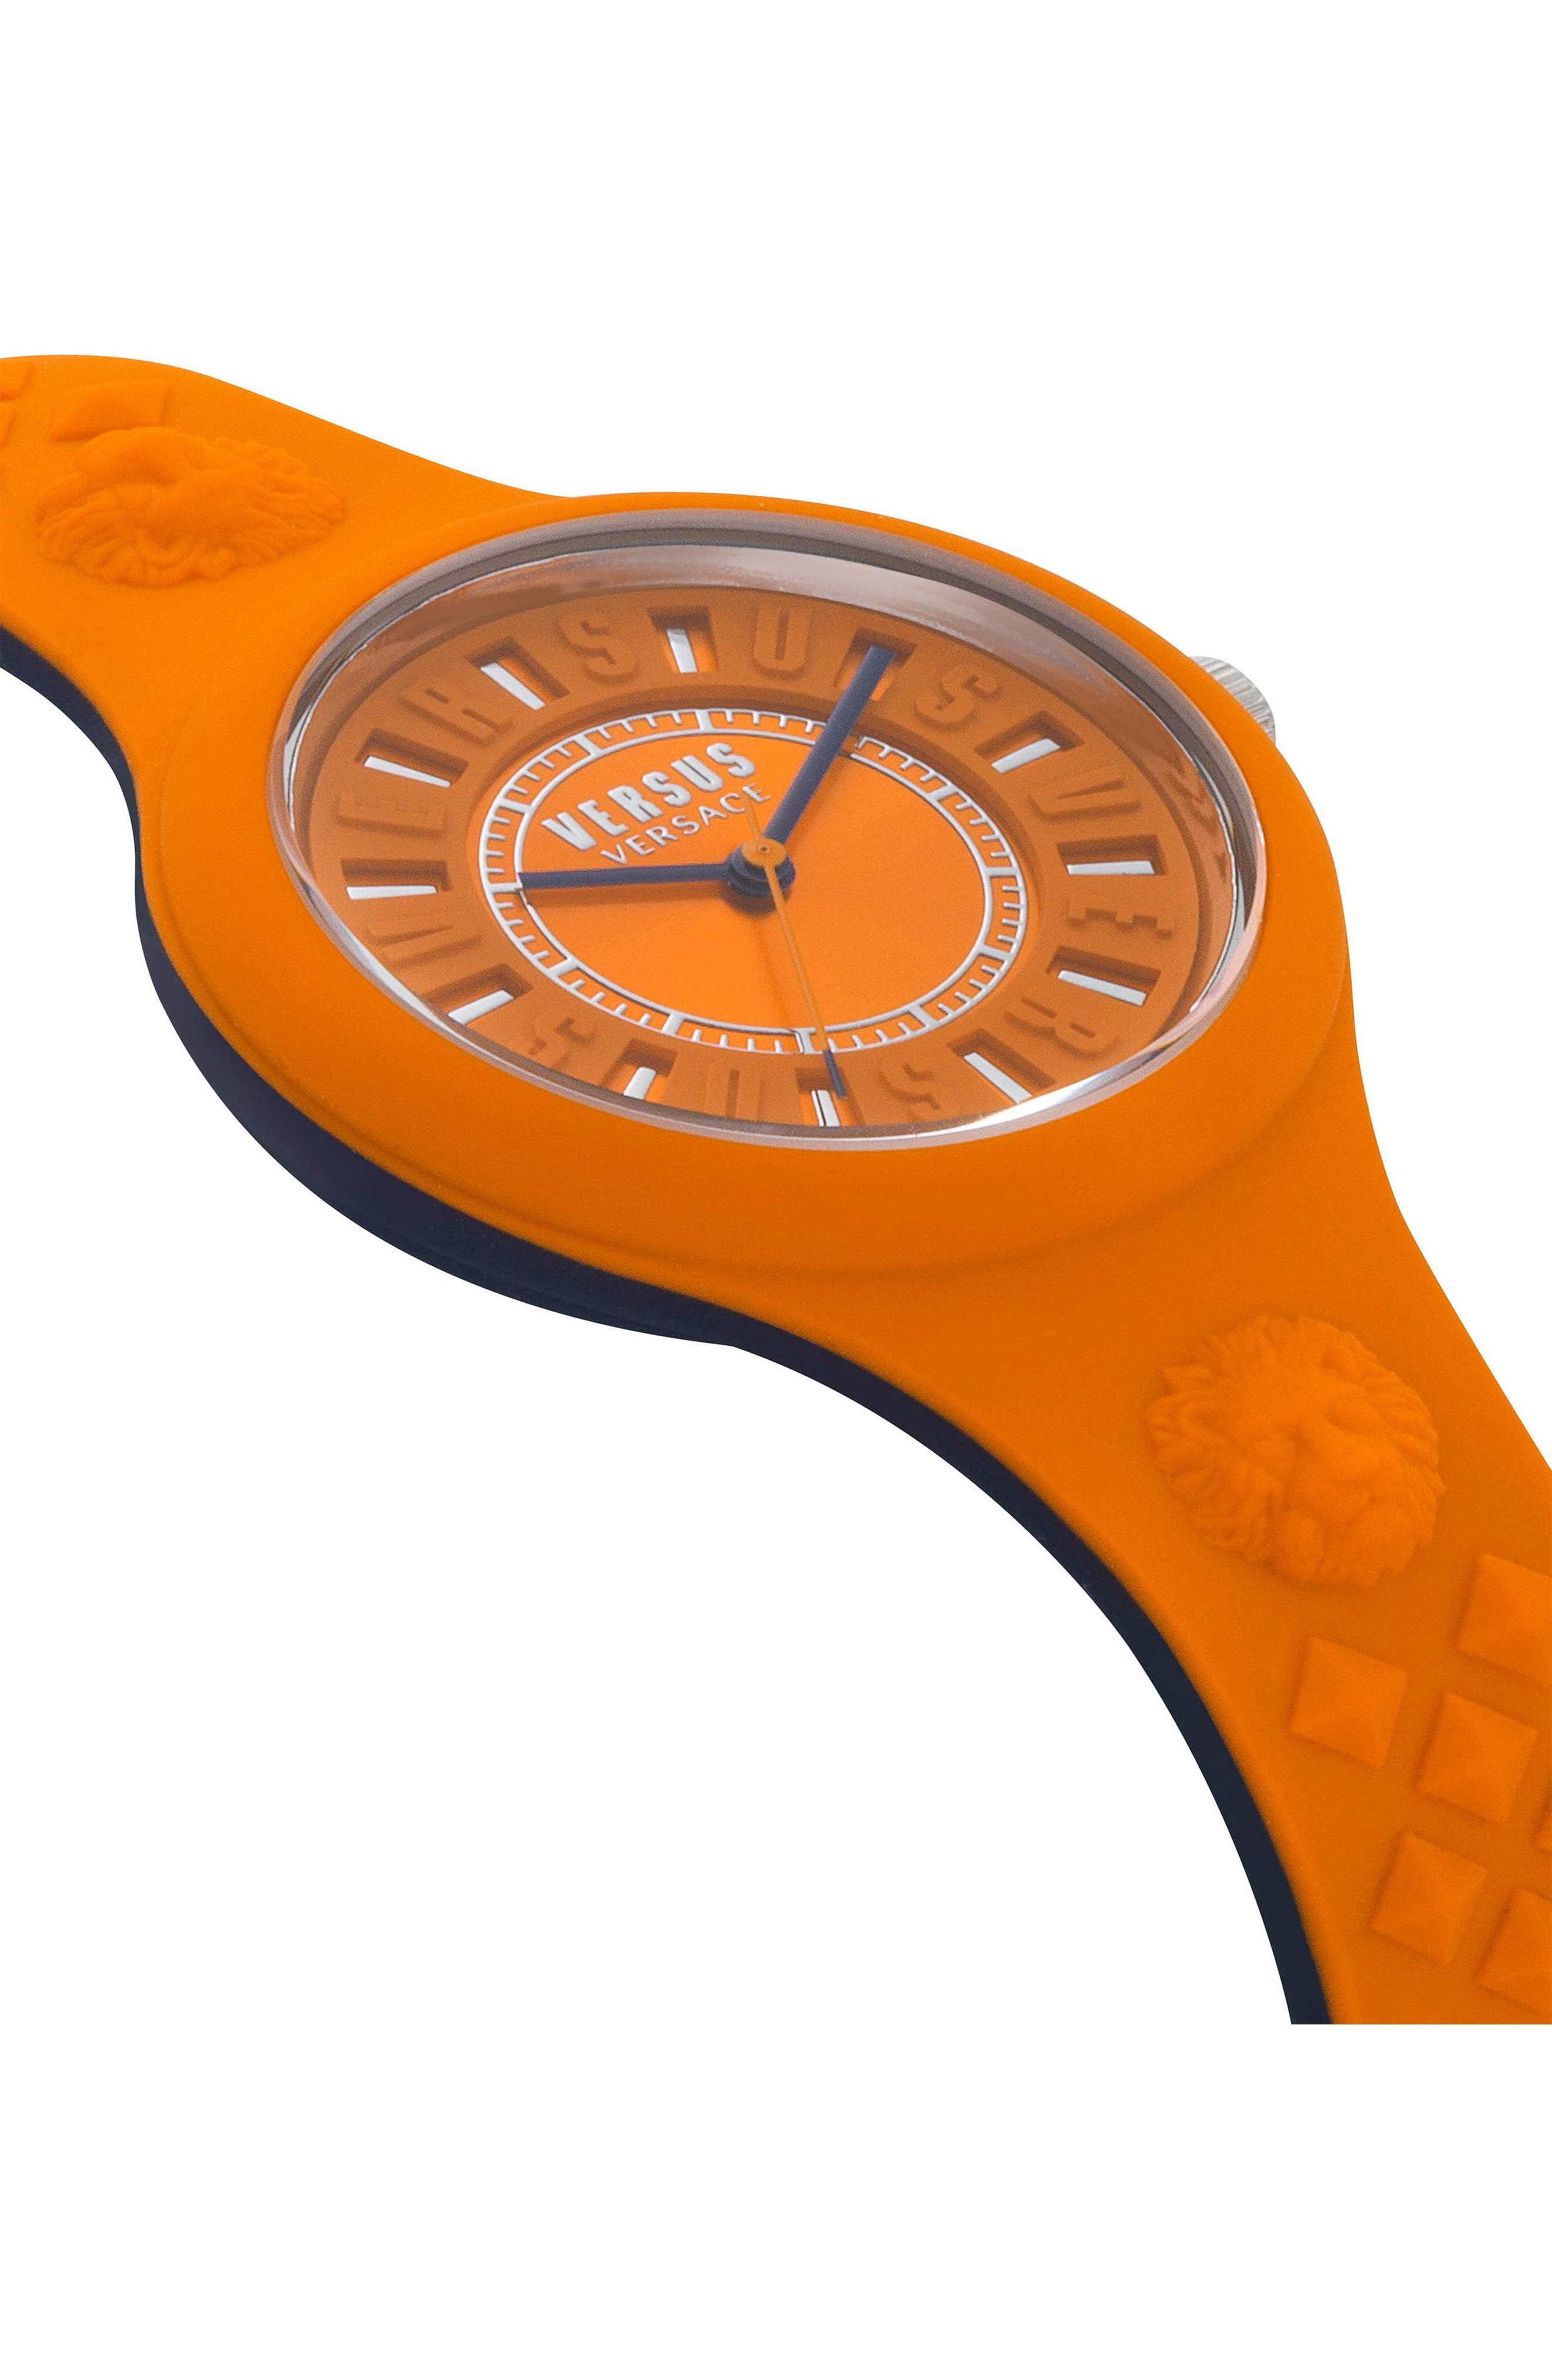 VERSUS VERSACE, Fire Island Silicone Strap Watch, 39mm, Alternate thumbnail 3, color, ORANGE/ GREY